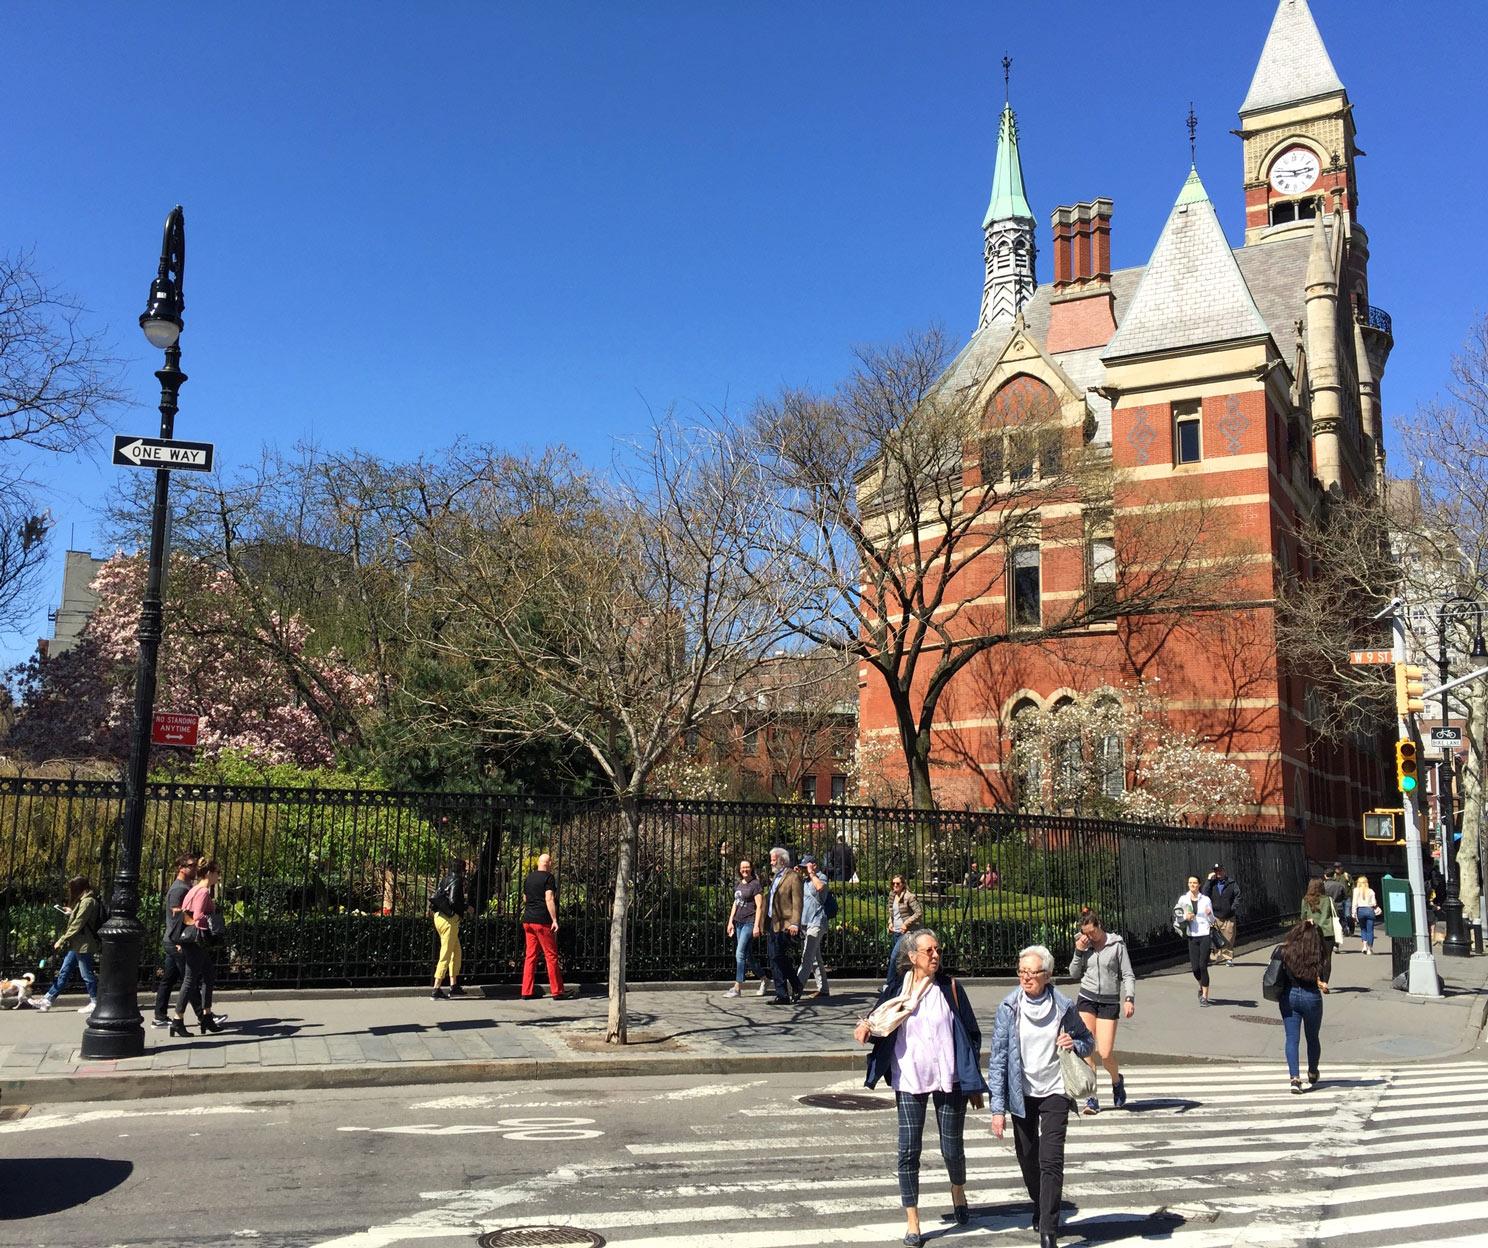 Jefferson-Market-Garden-Library-New-York-City-Spring.jpg